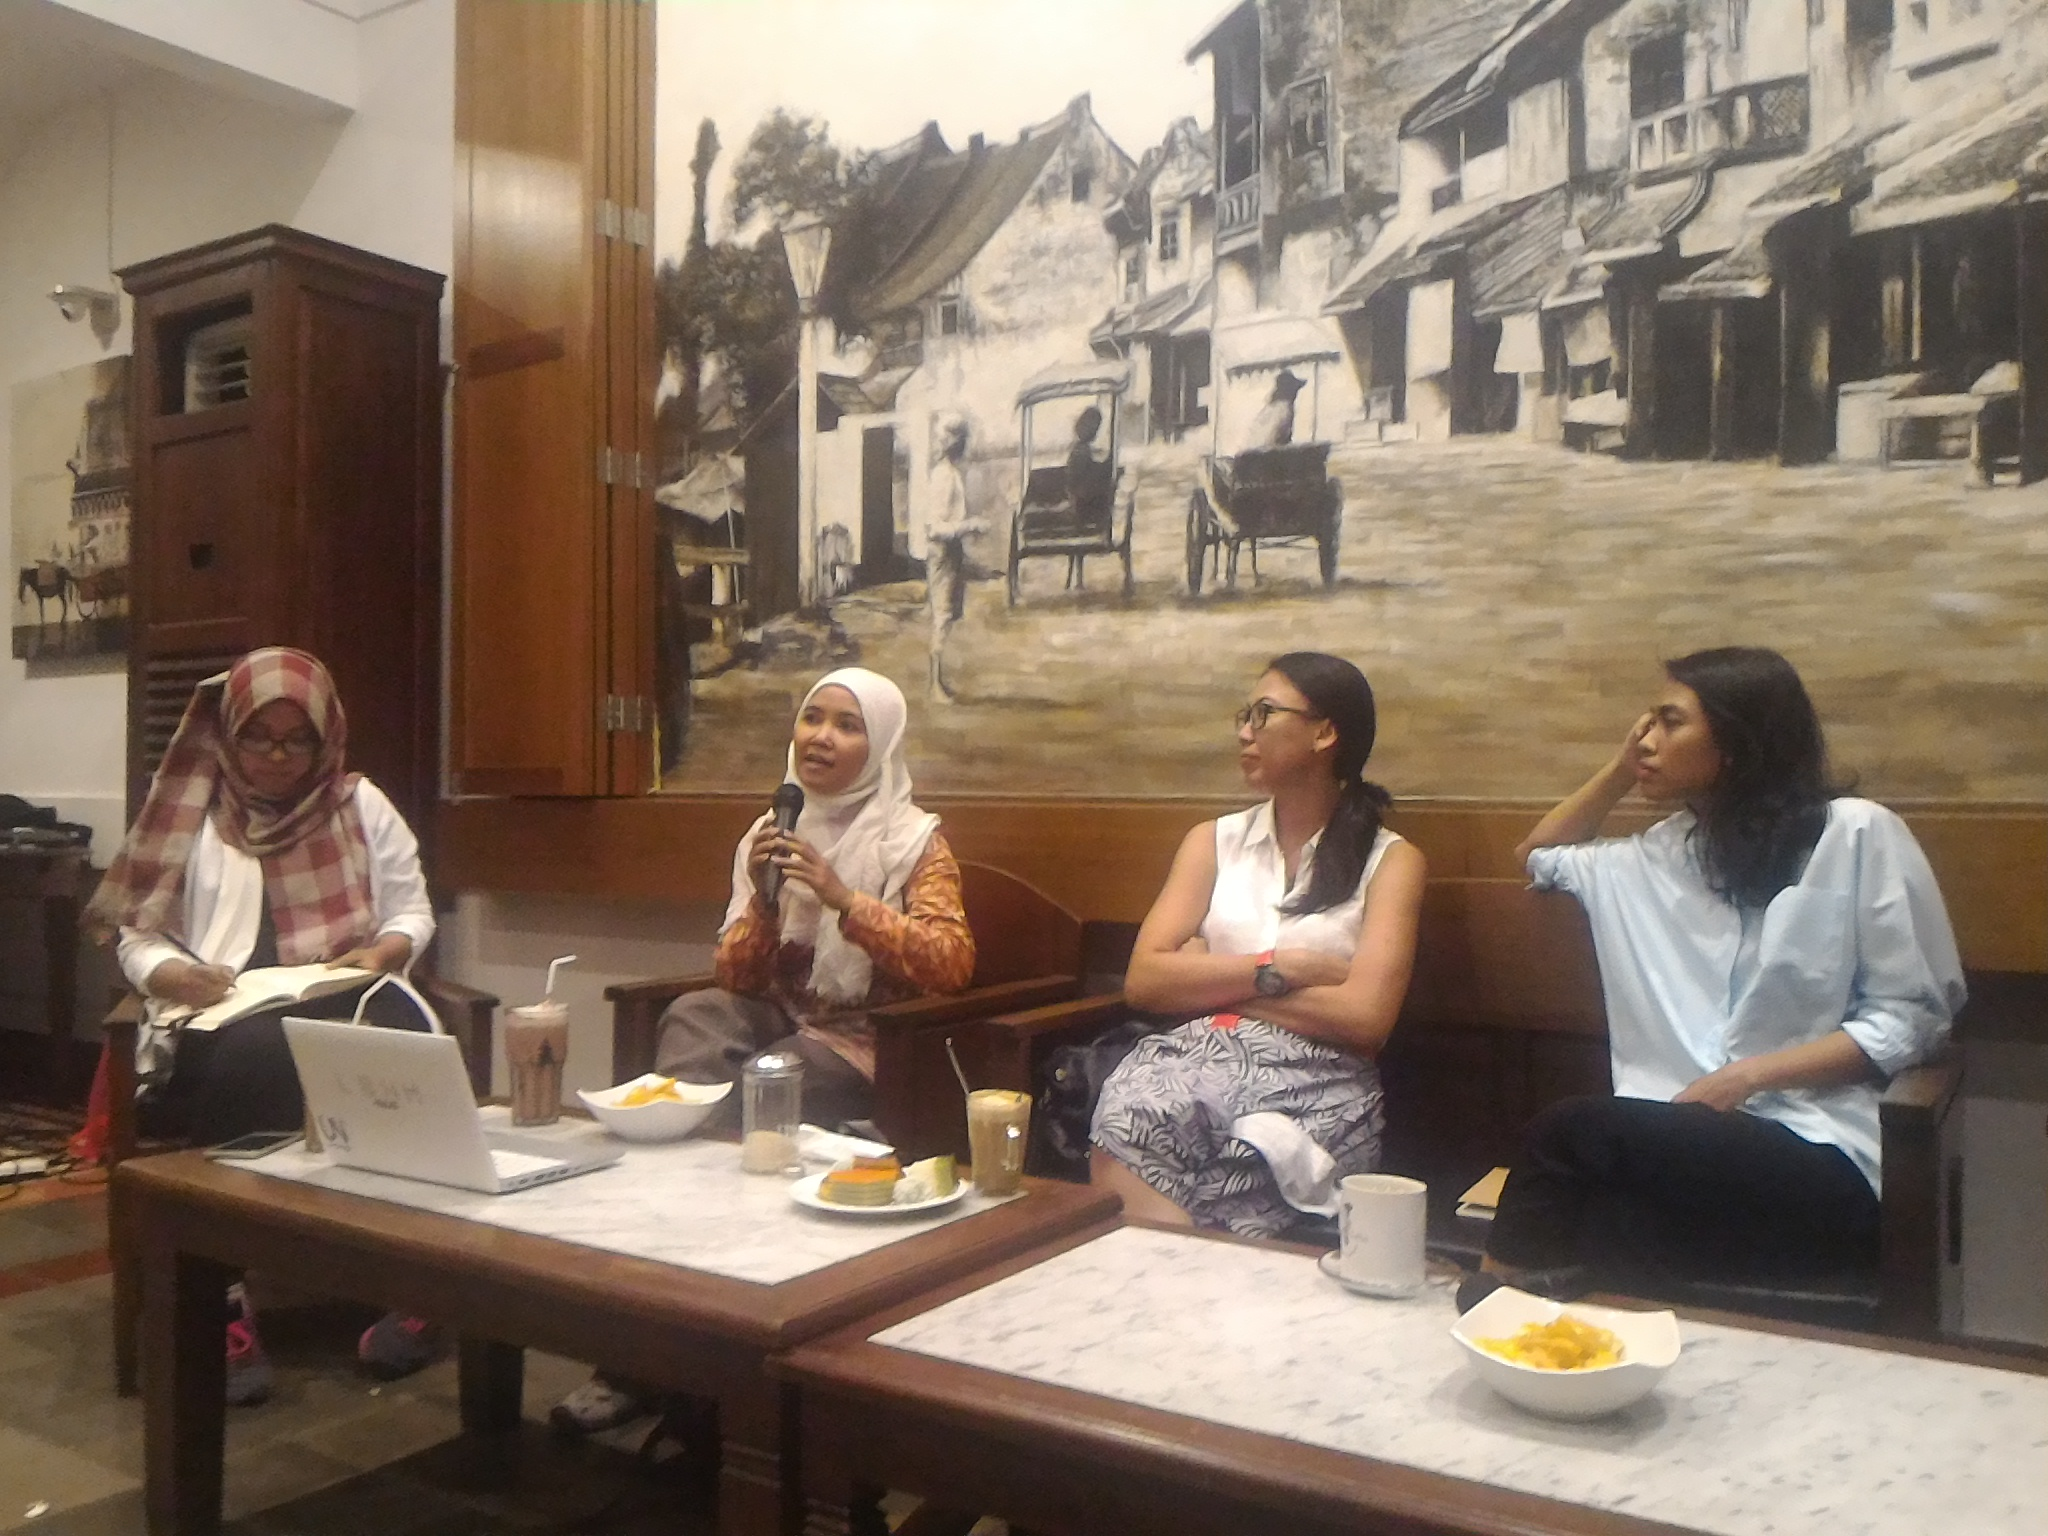 Naila Rizqi menjadi moderator penutupan LIGHTS 2016 yang menghadirkan 3 perempuan tangguh sebagai pembicara: Siti Aminah, Tunggal Pawestri, Prodita Sabarani